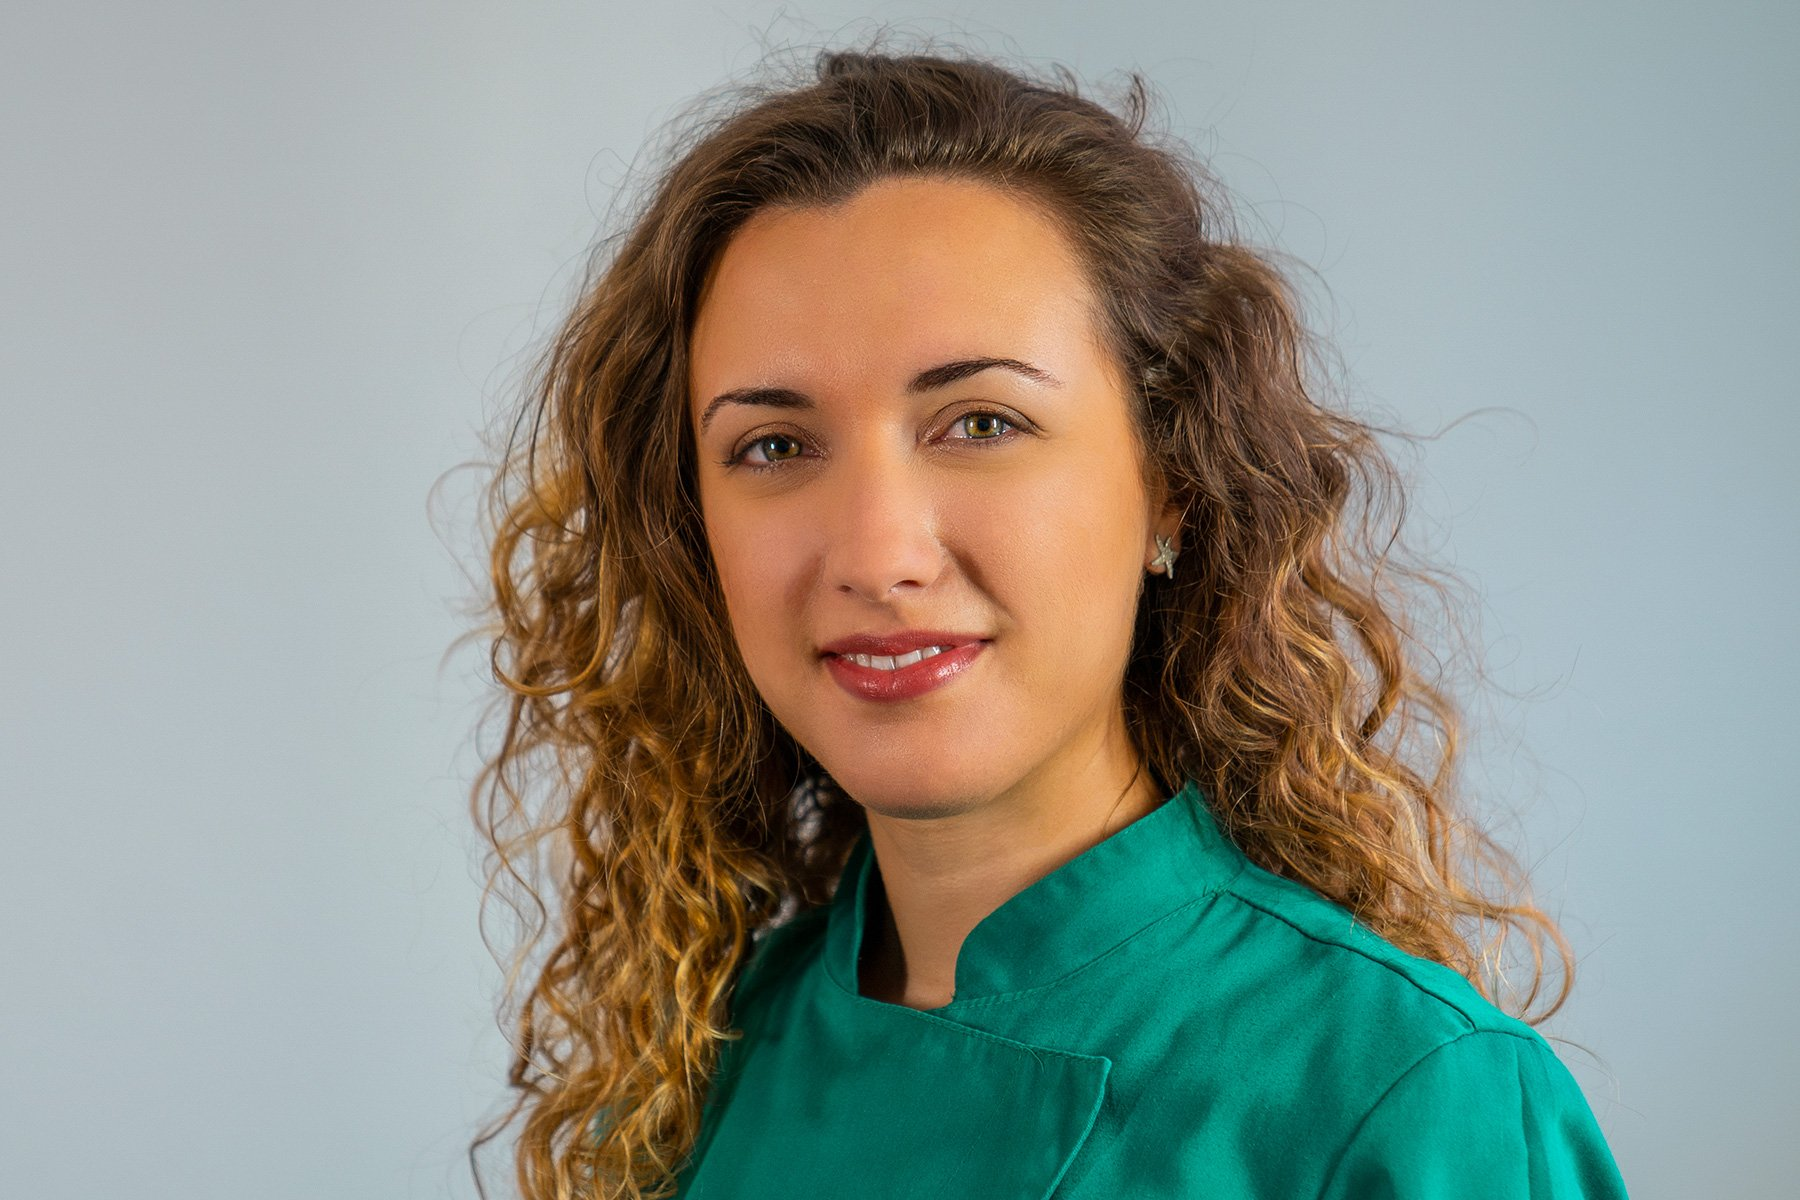 Dott.ssa Erica Mazzarotto